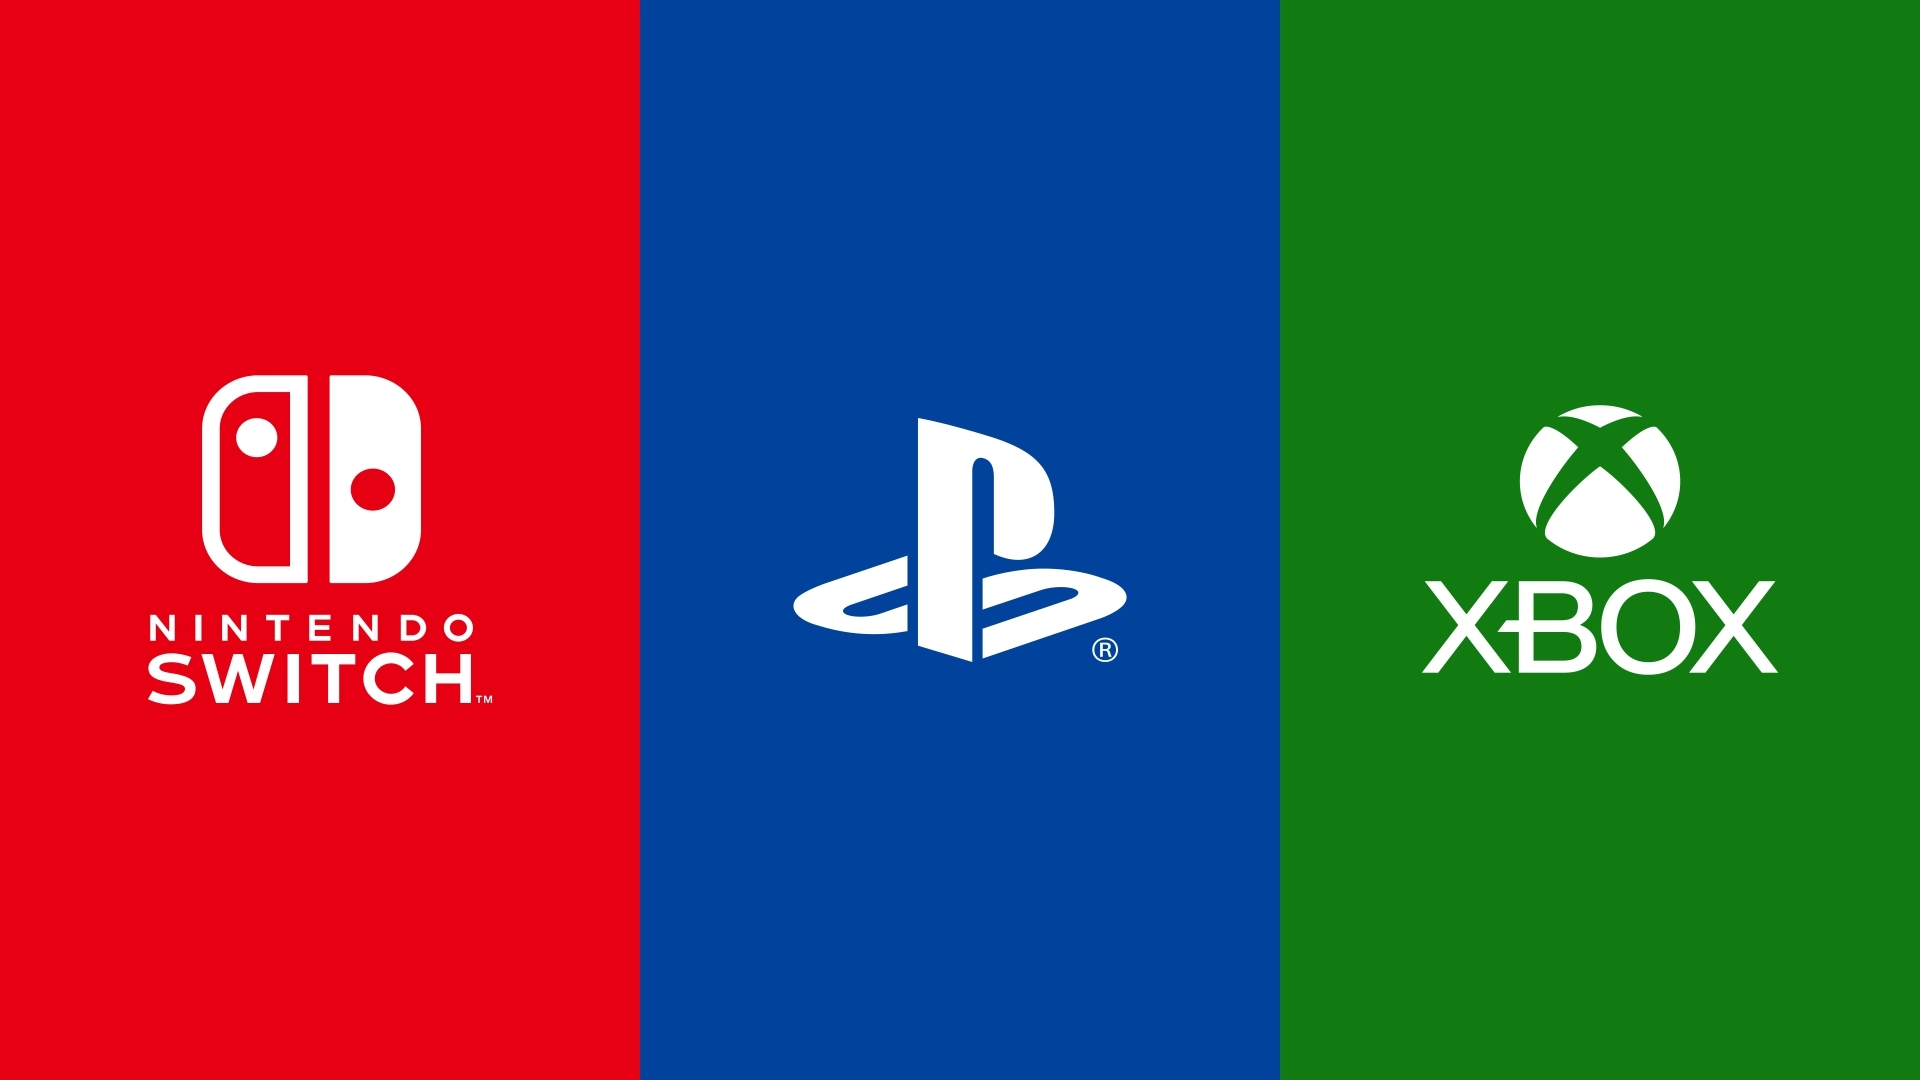 Nintendo, Playstation, Xbox